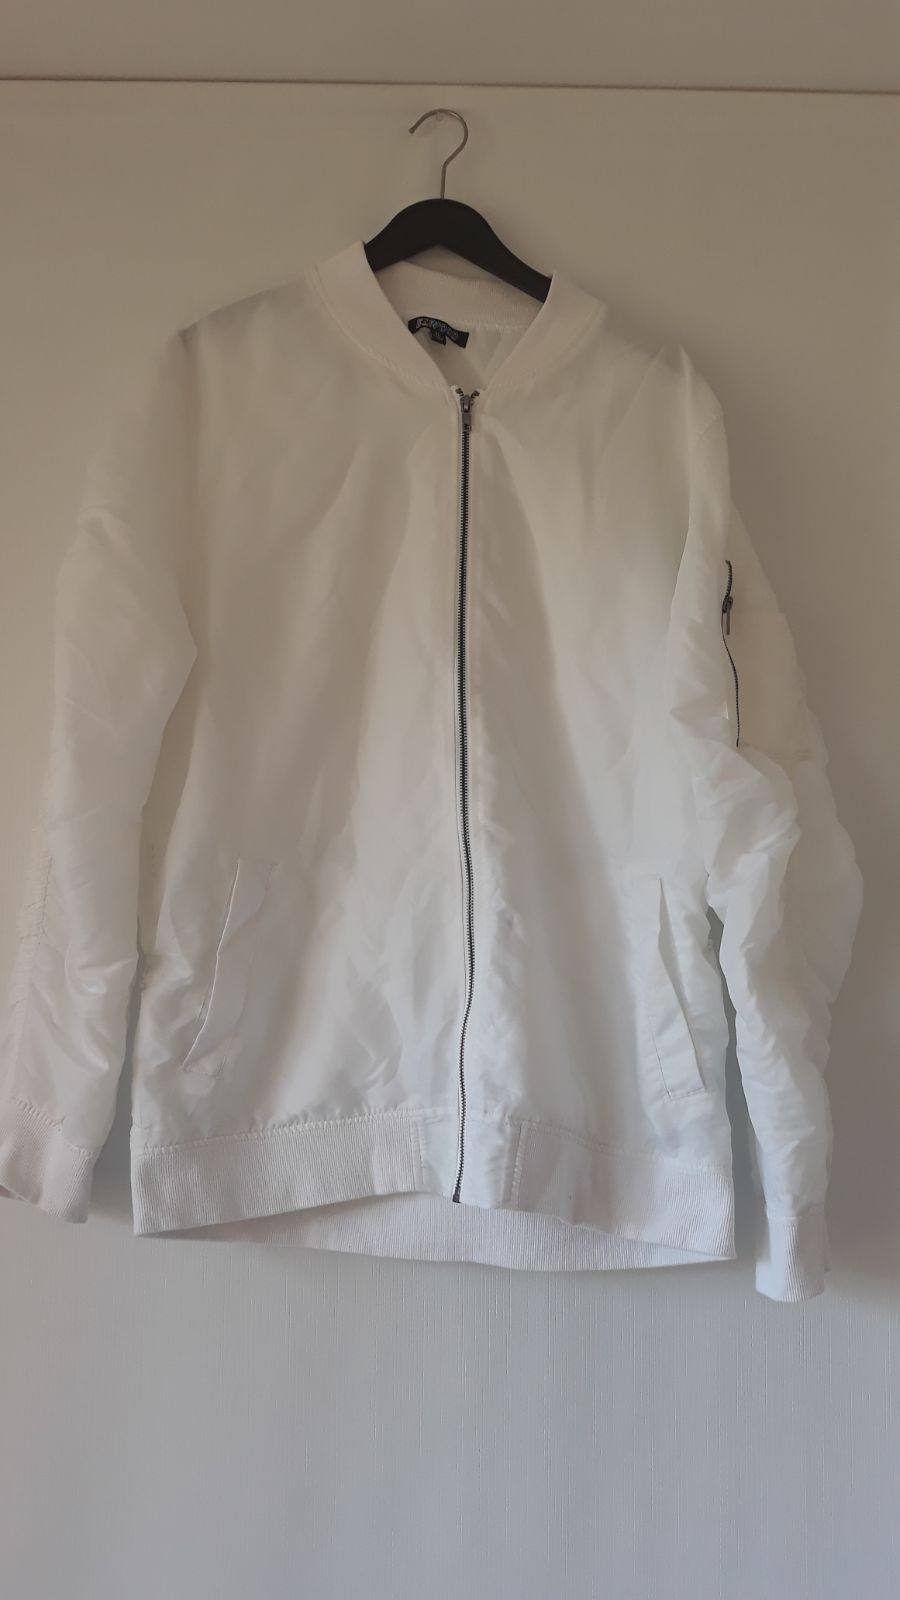 White Rue 21 Bomber Jacket